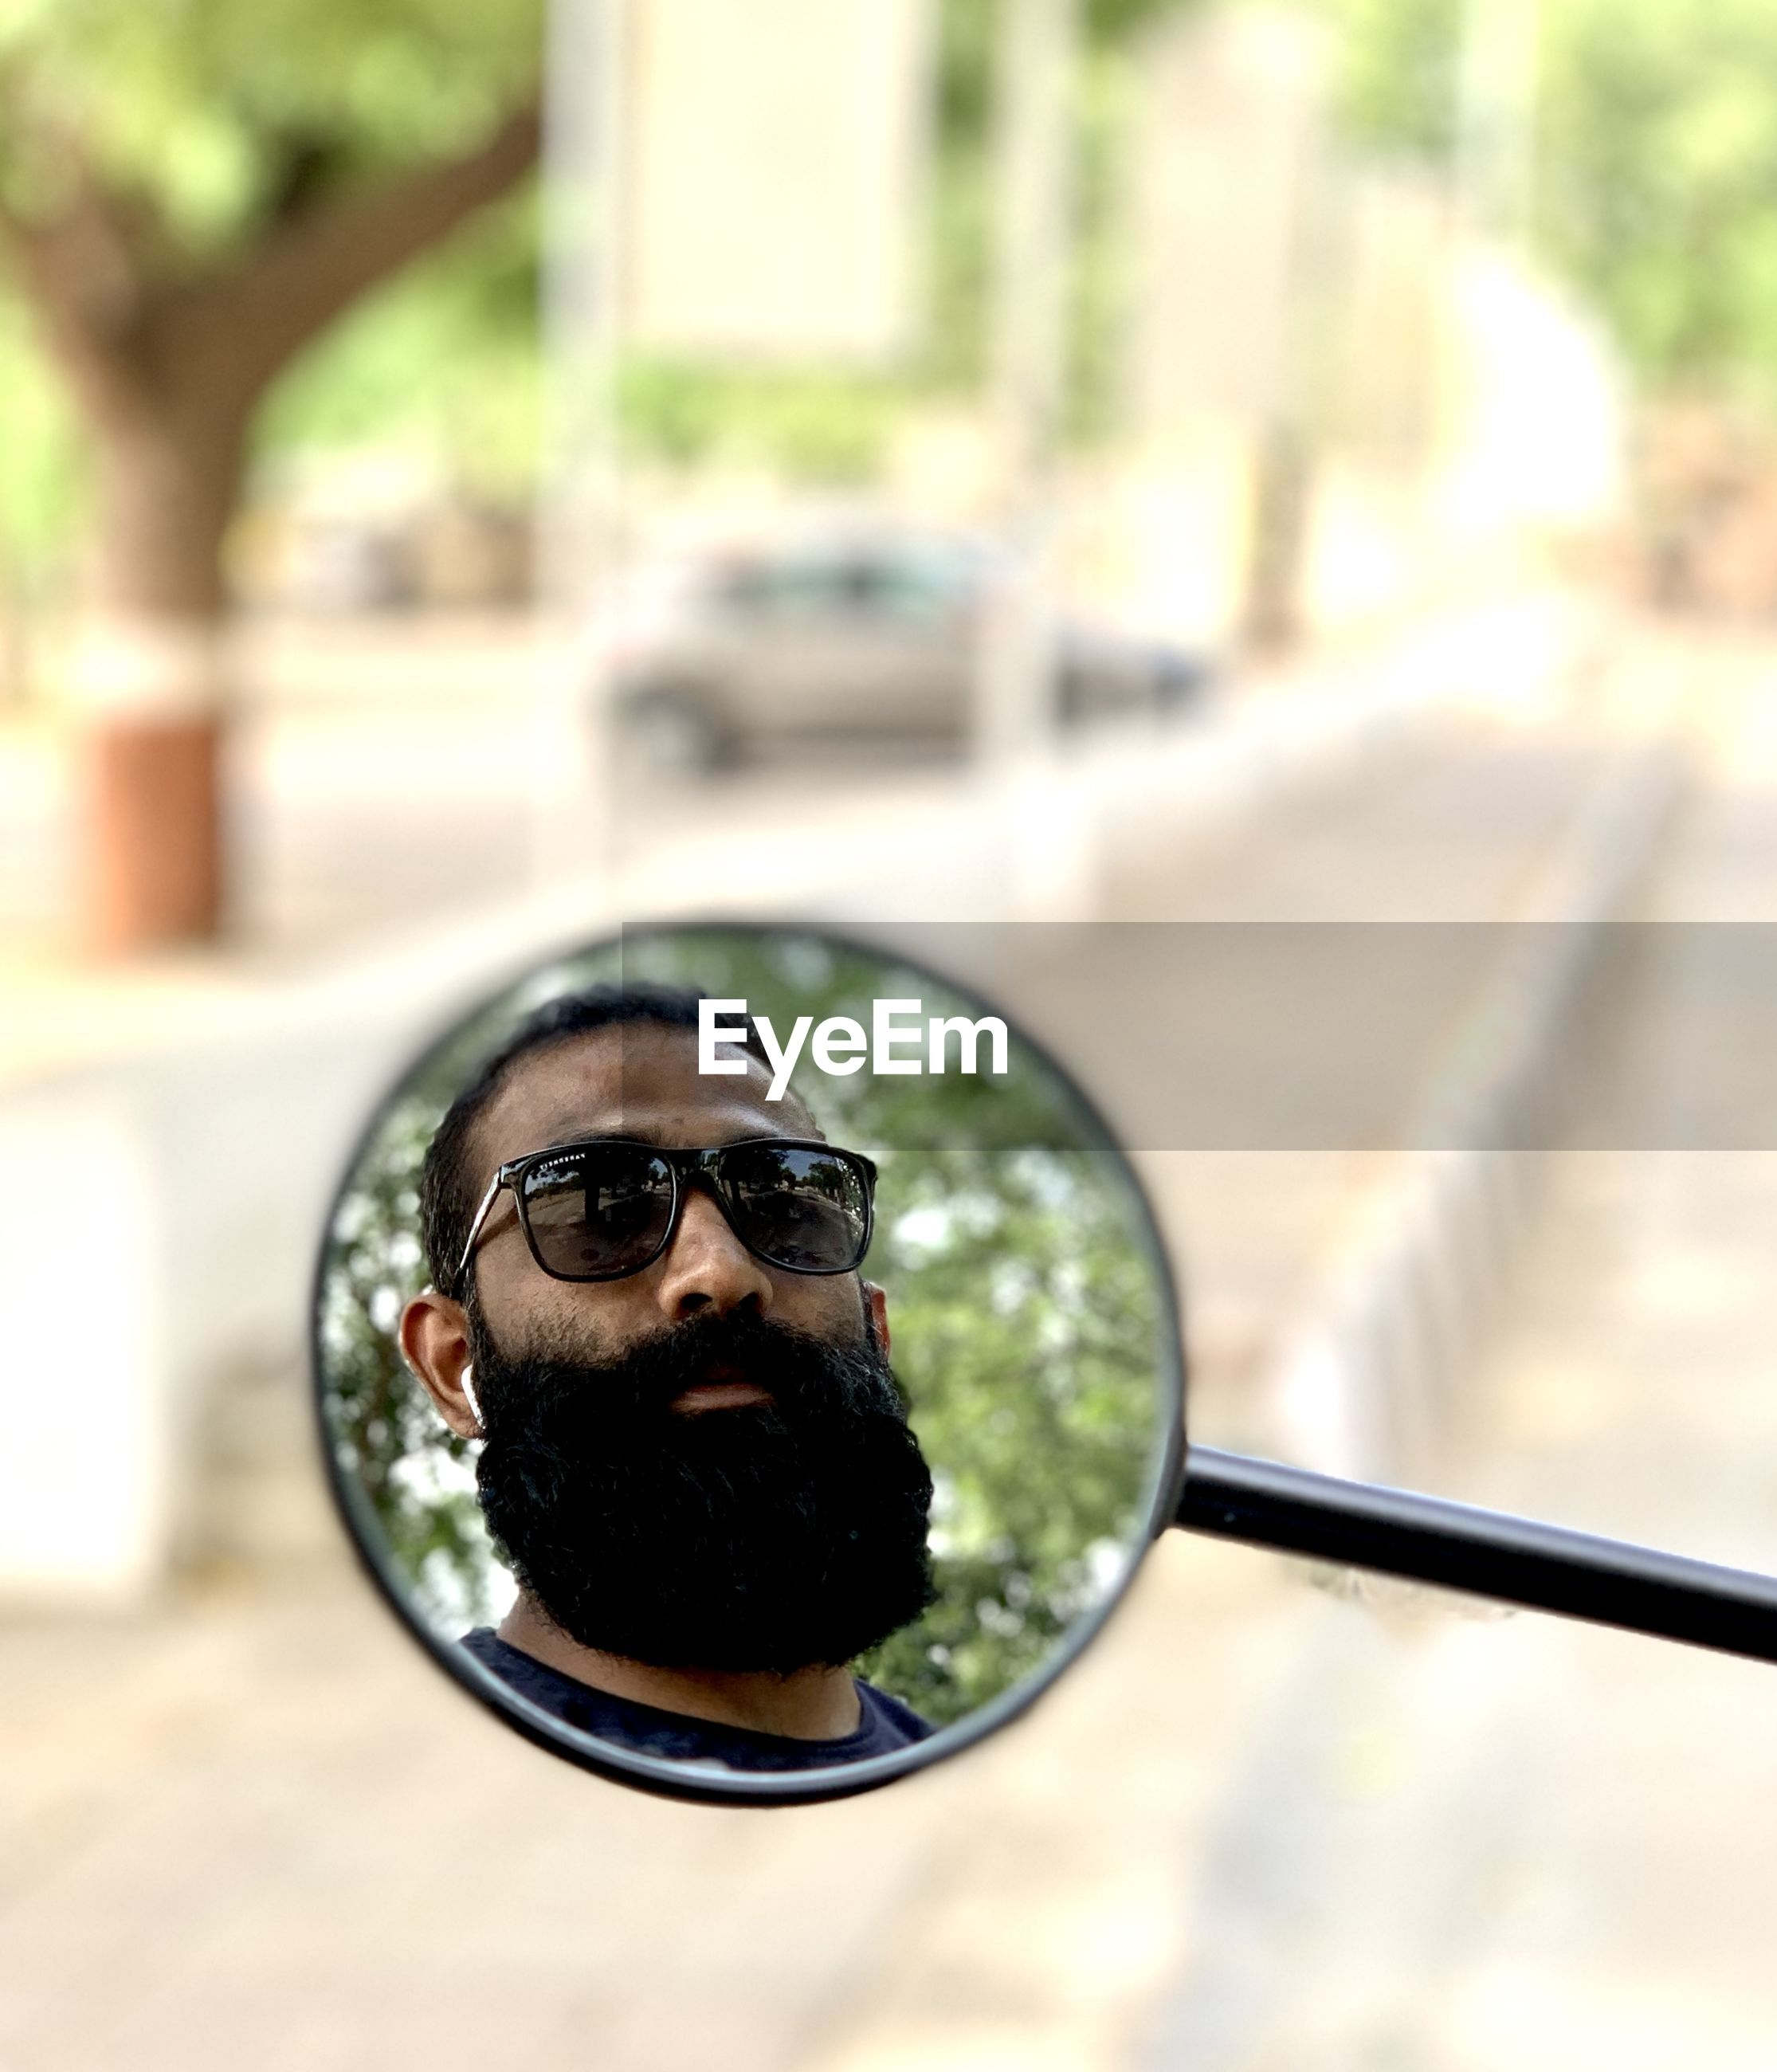 Reflection of man on bike mirror